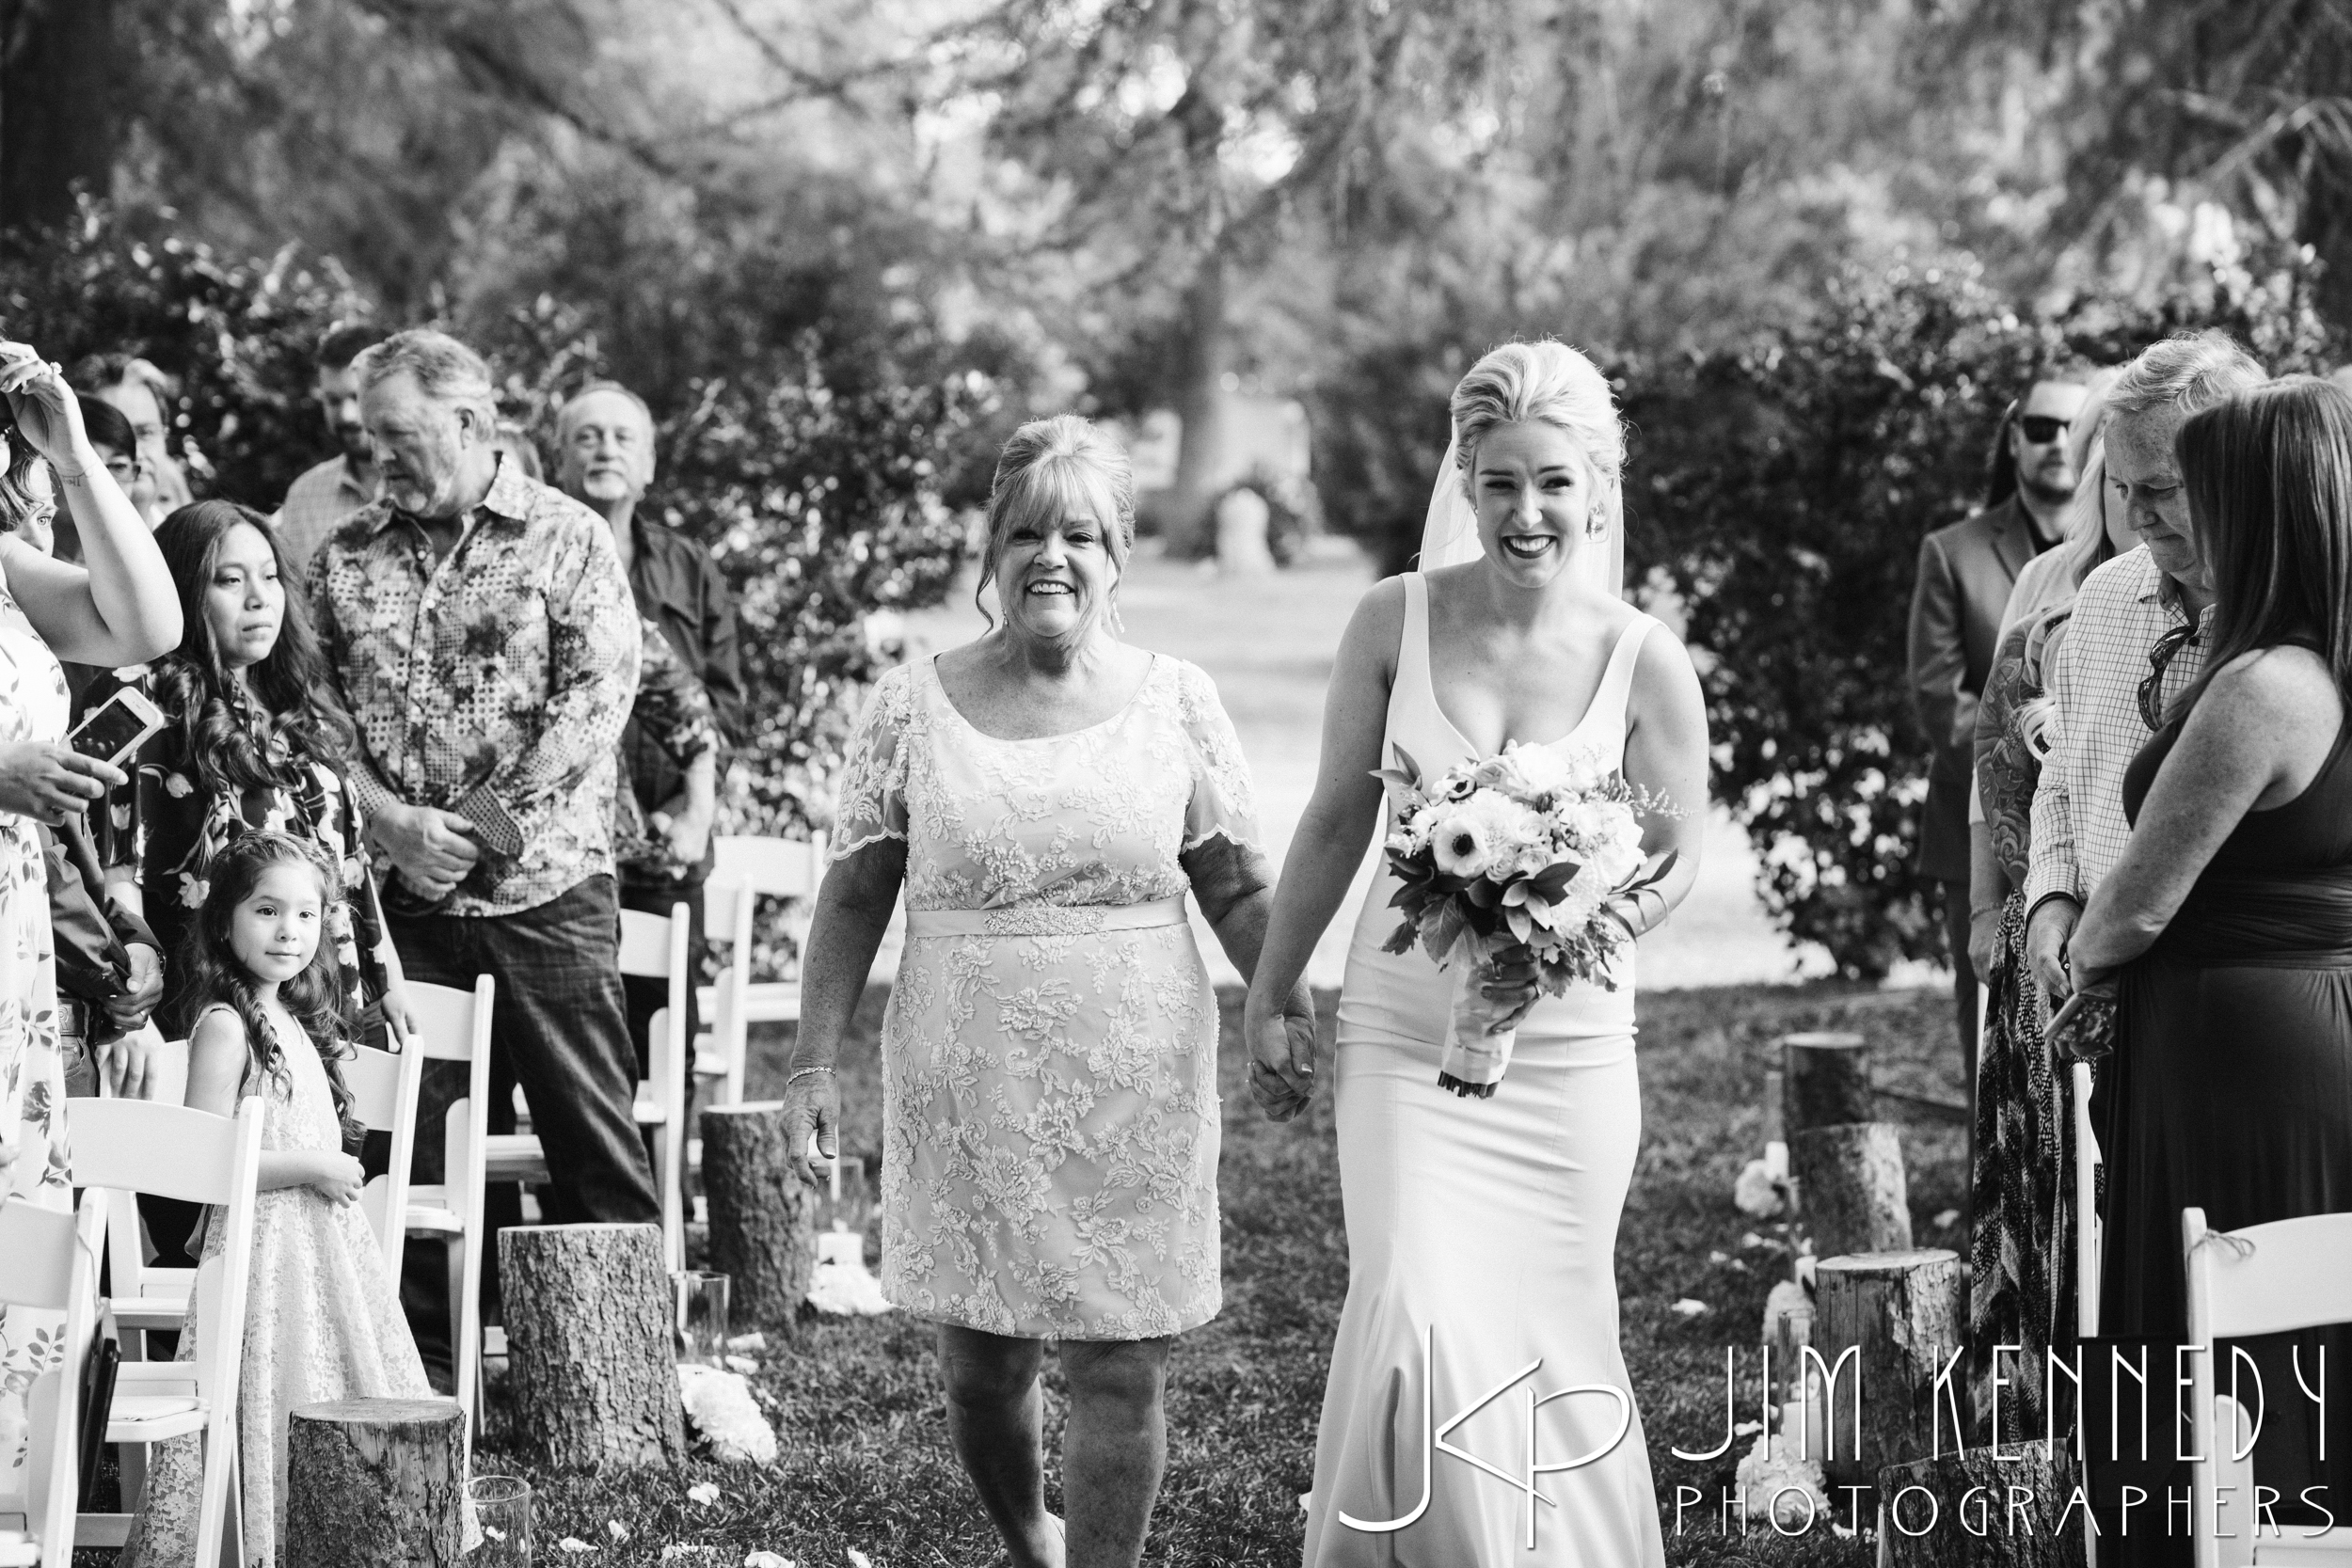 jim_kennedy_photographers_highland_springs_wedding_caitlyn_0103.jpg